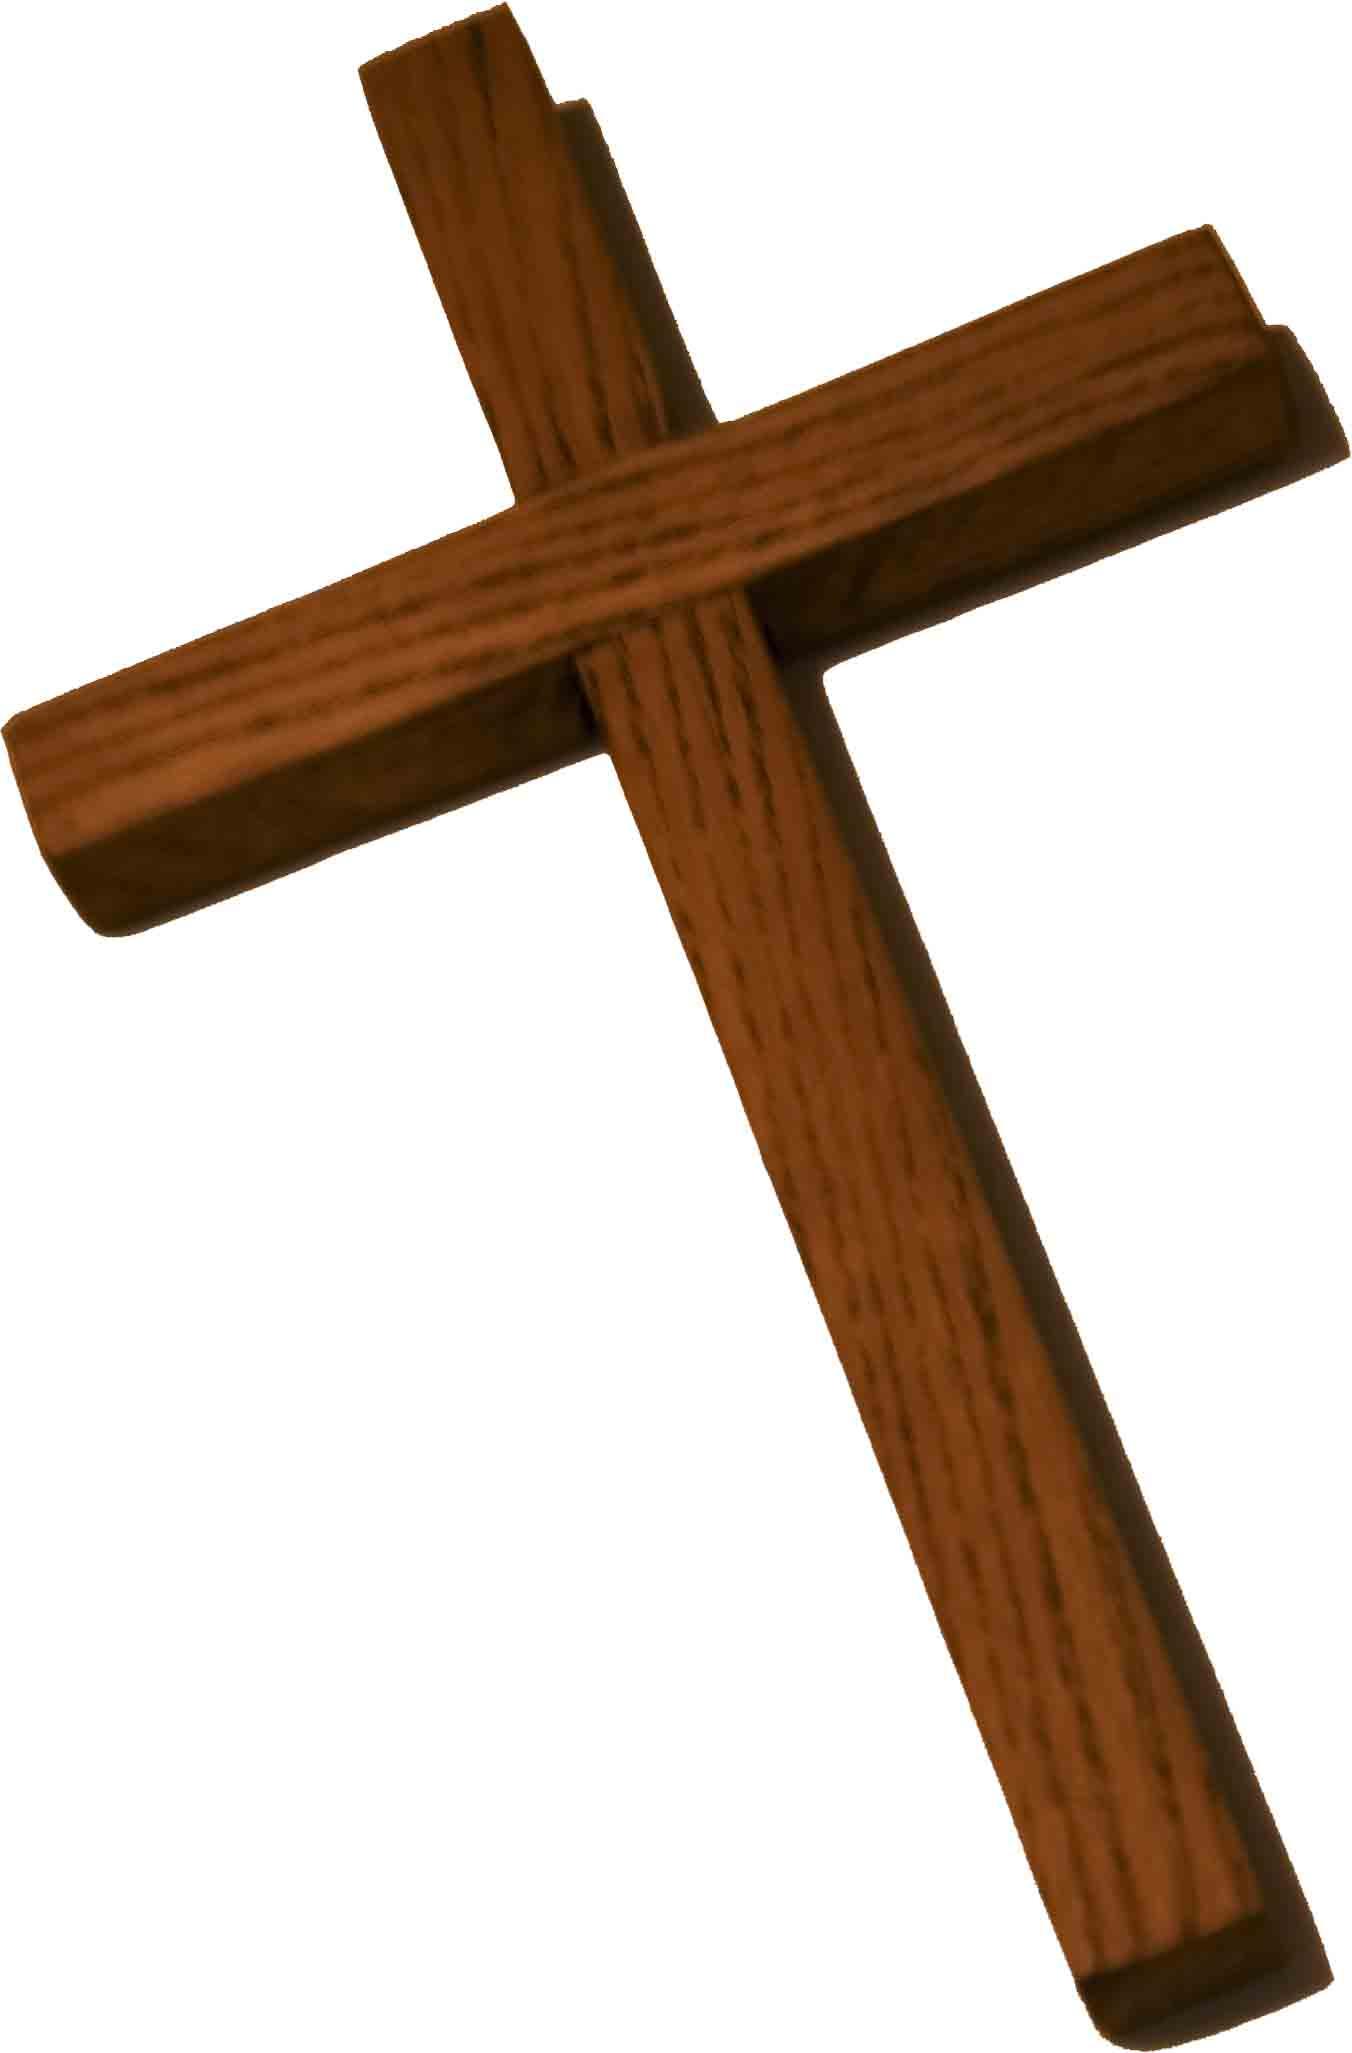 1352x2053 Wooden Crosses Clipart